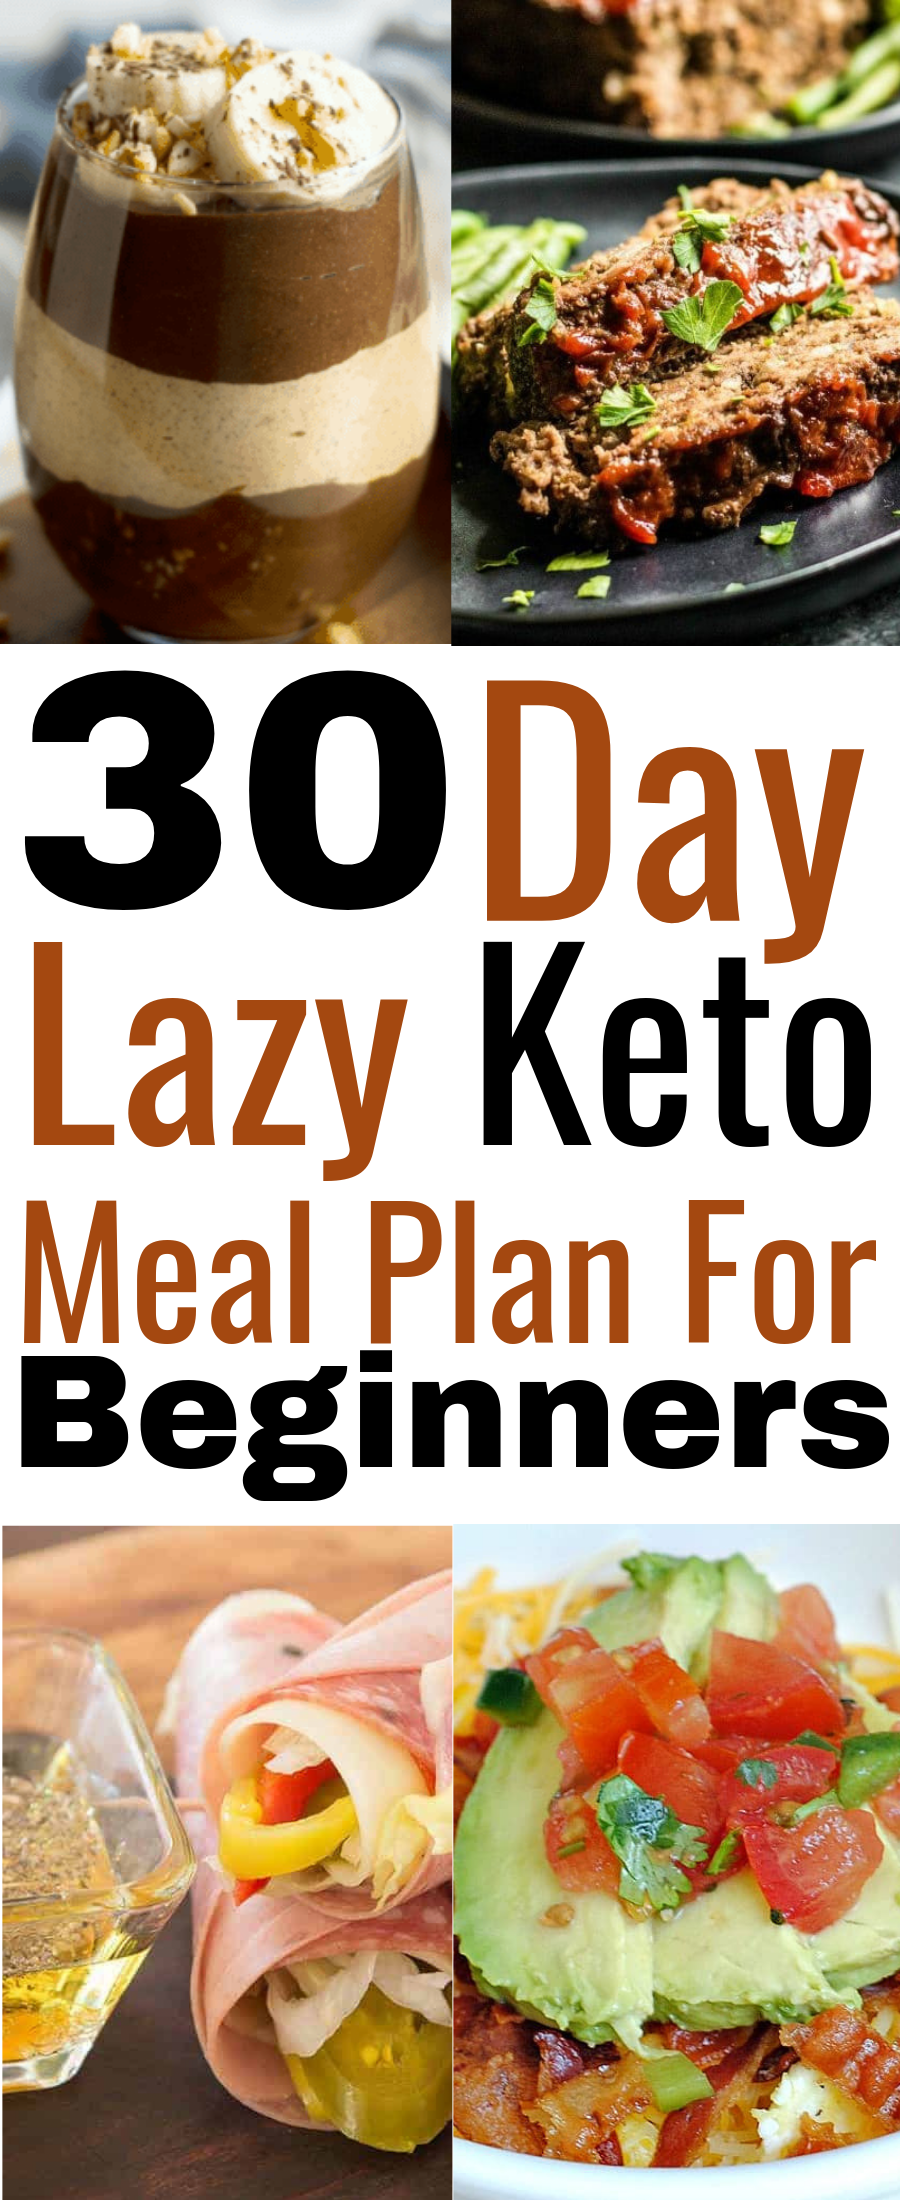 keto diet for lazy beginners